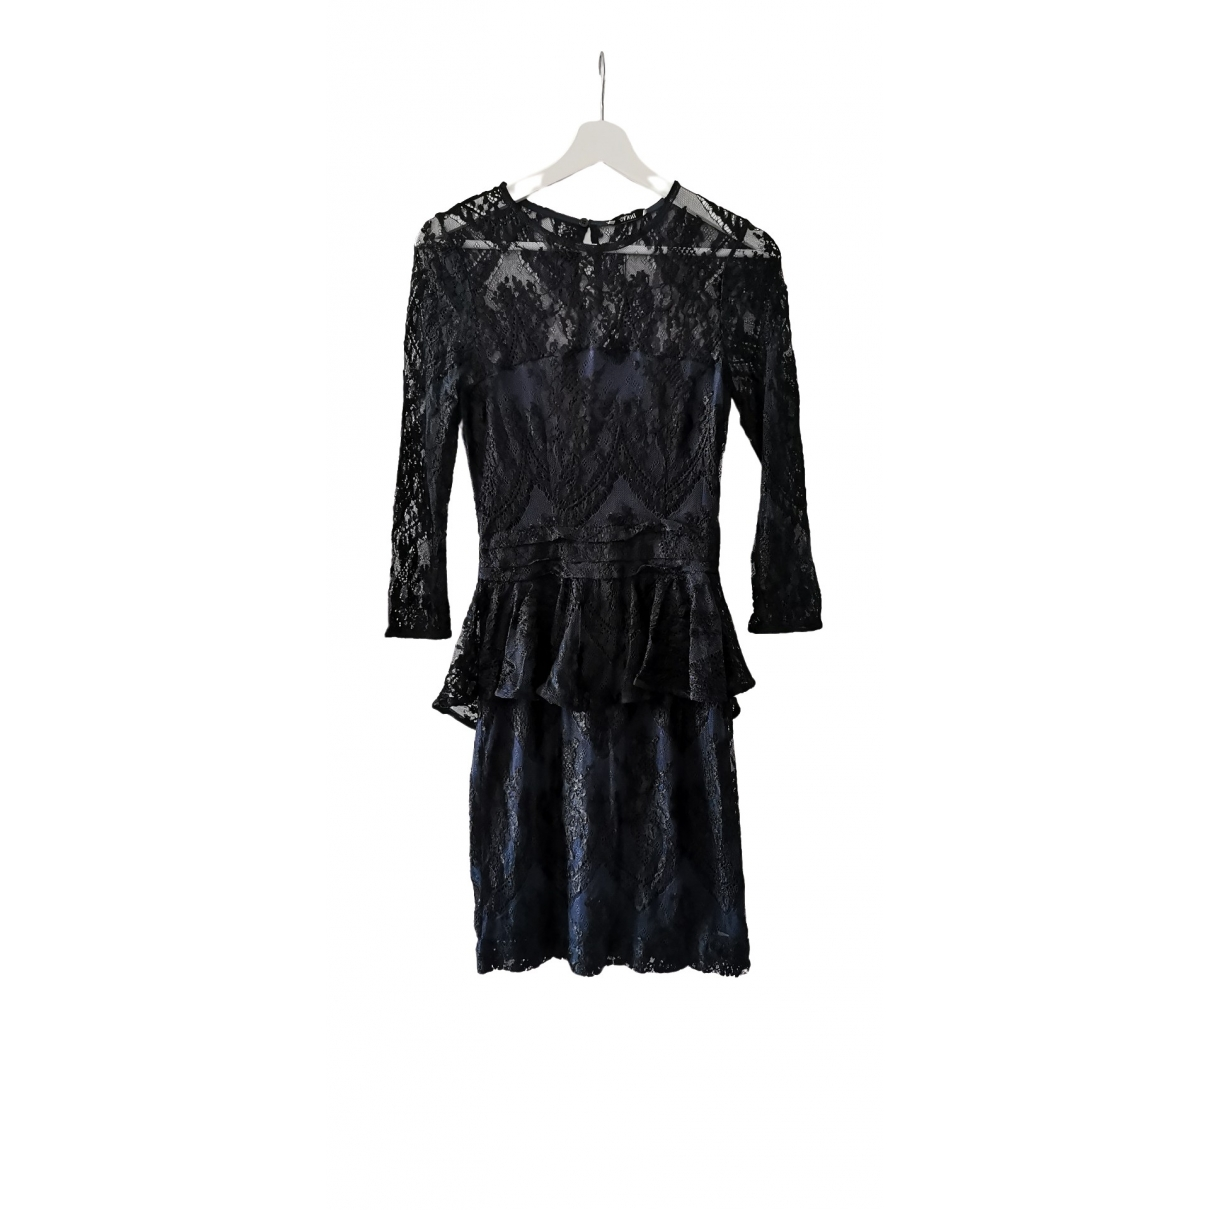 Ganni \N Black dress for Women XS International